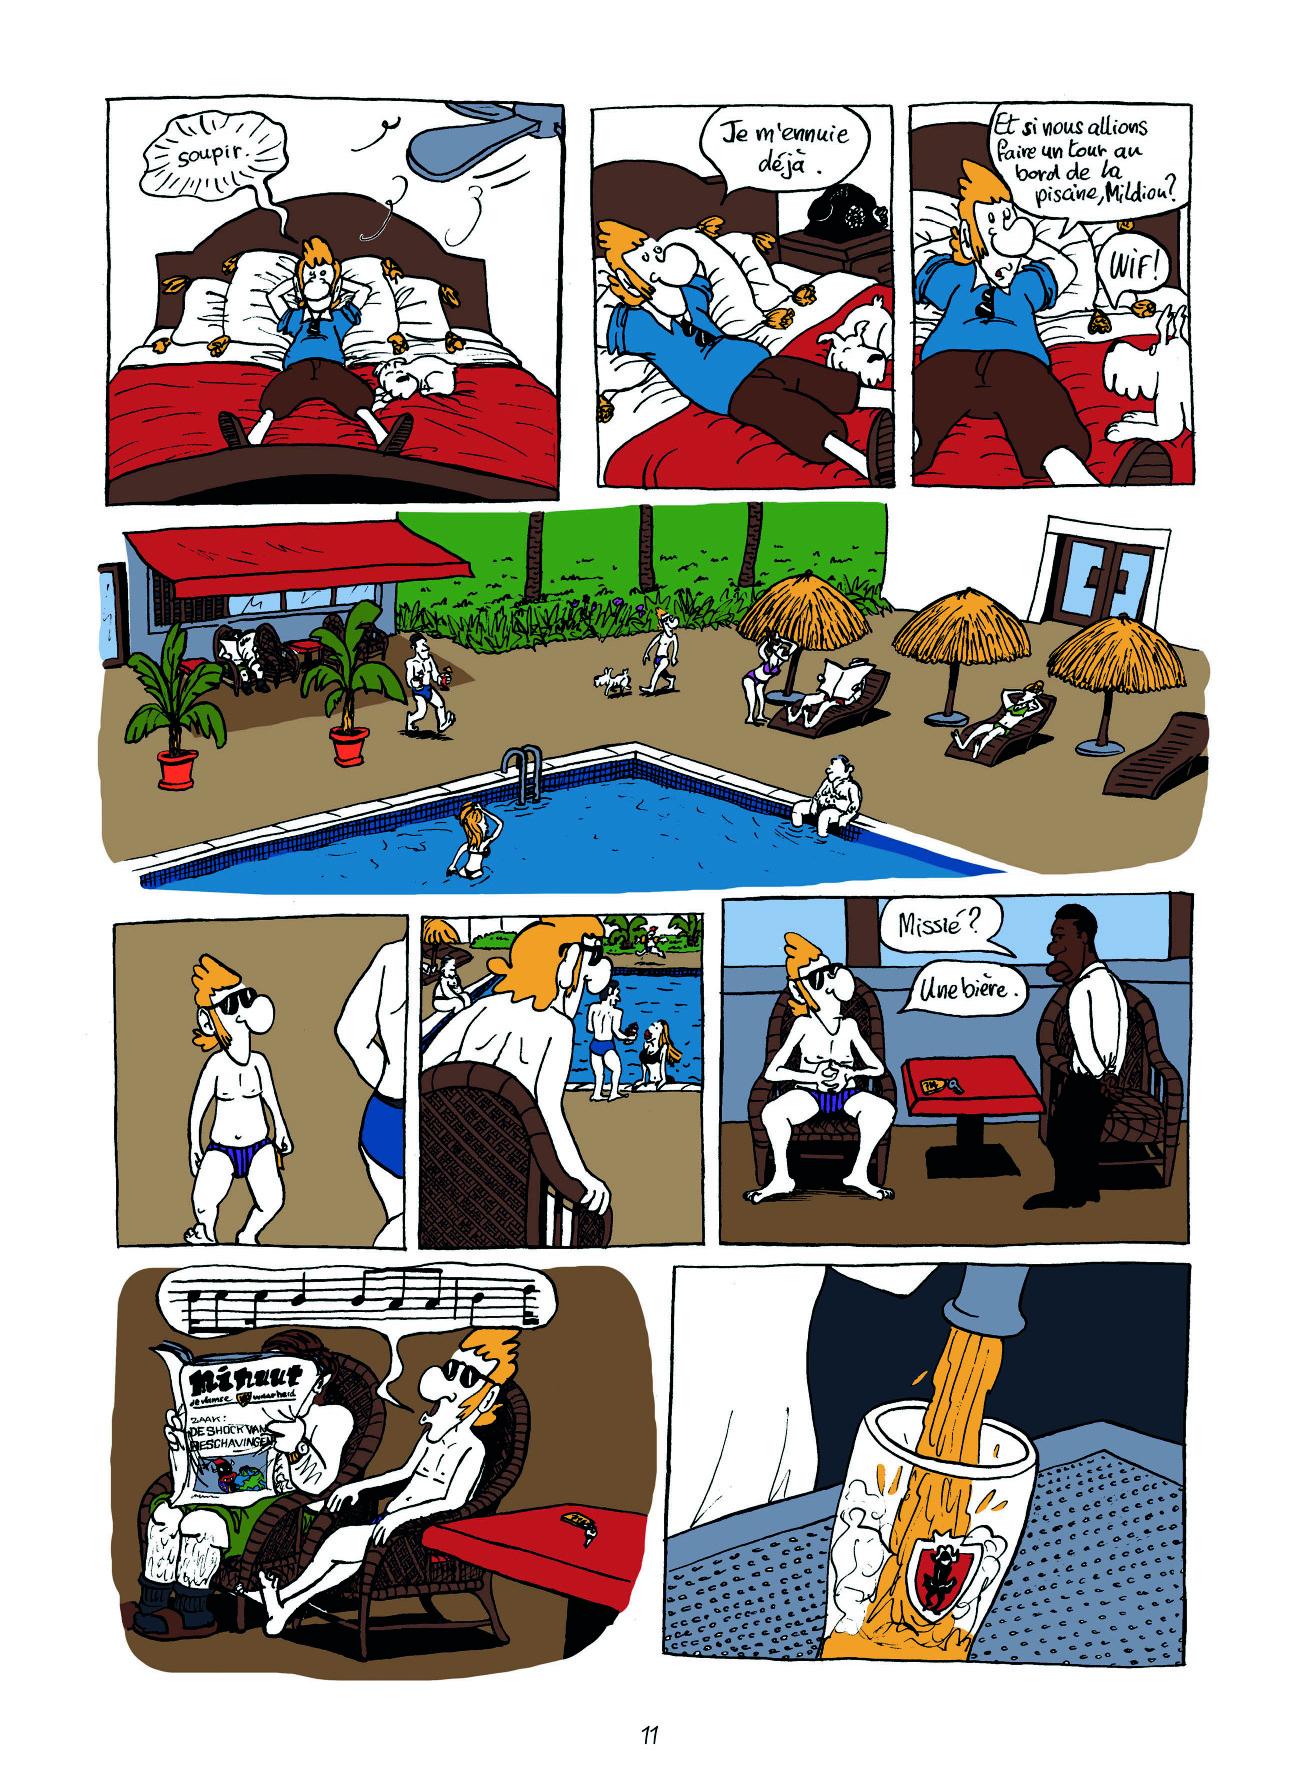 Extrait n°5 Lipanda par Bazil